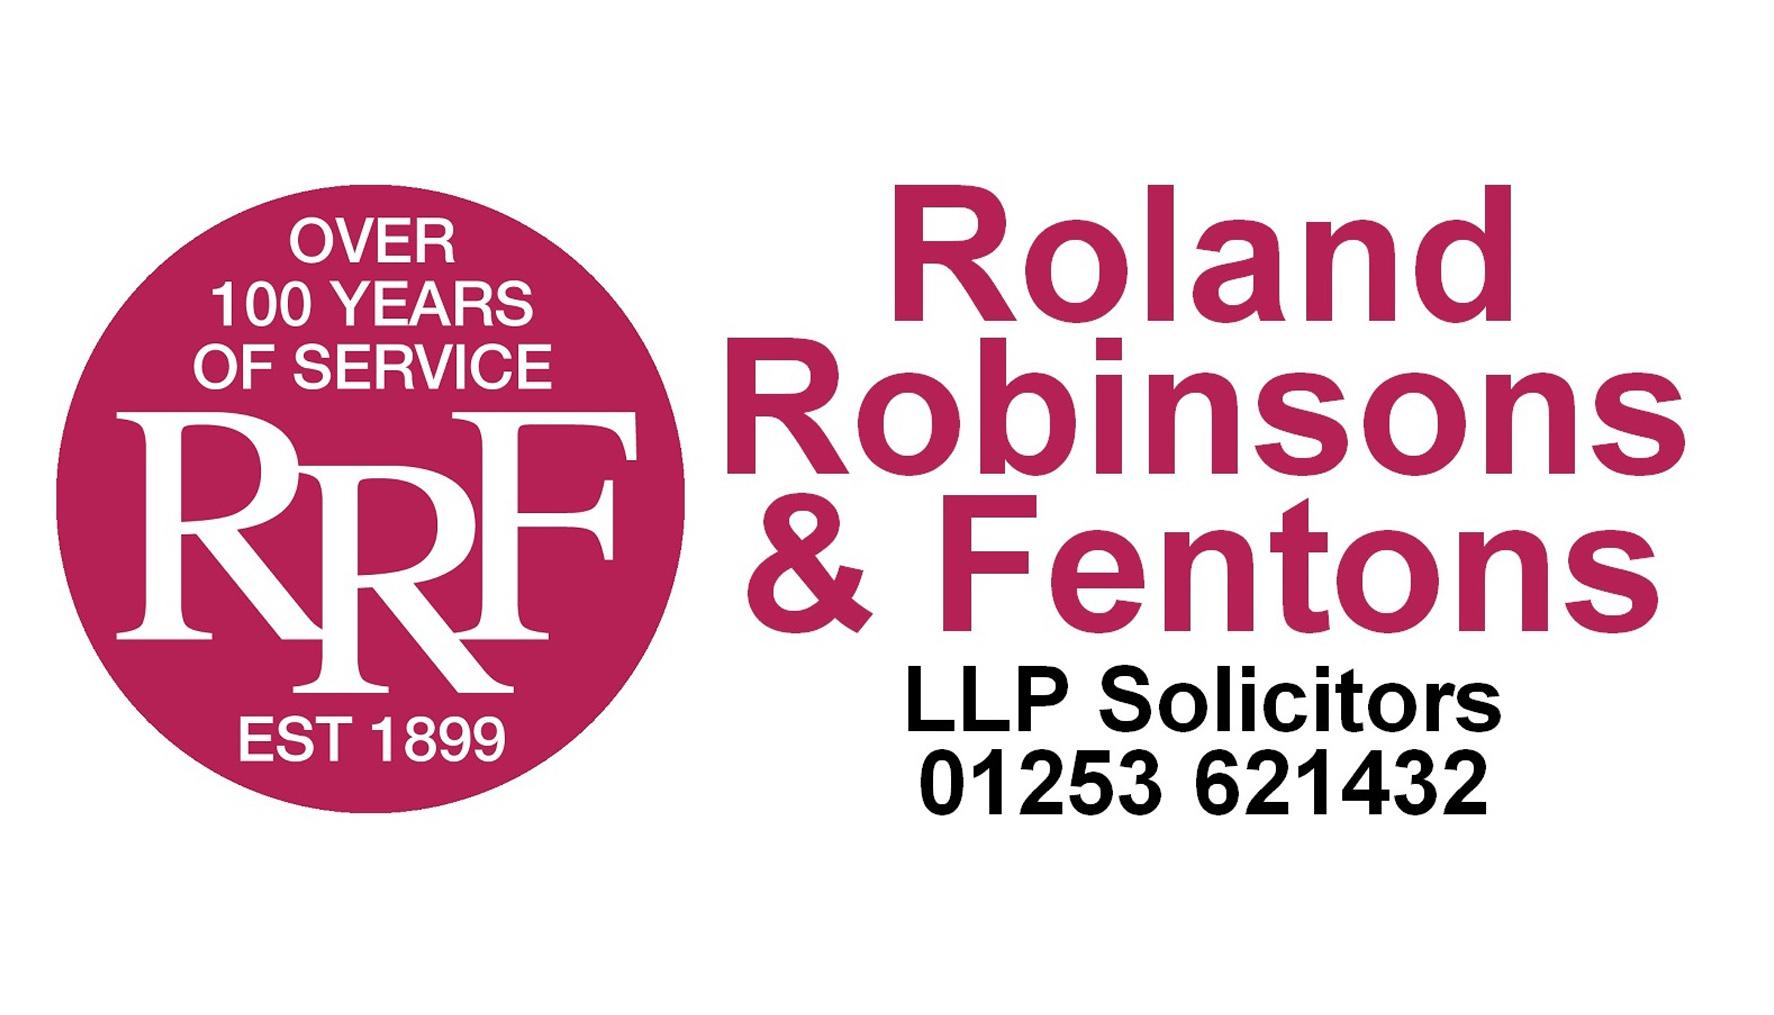 Roland Robinsons & Fentons LLP Solicitors